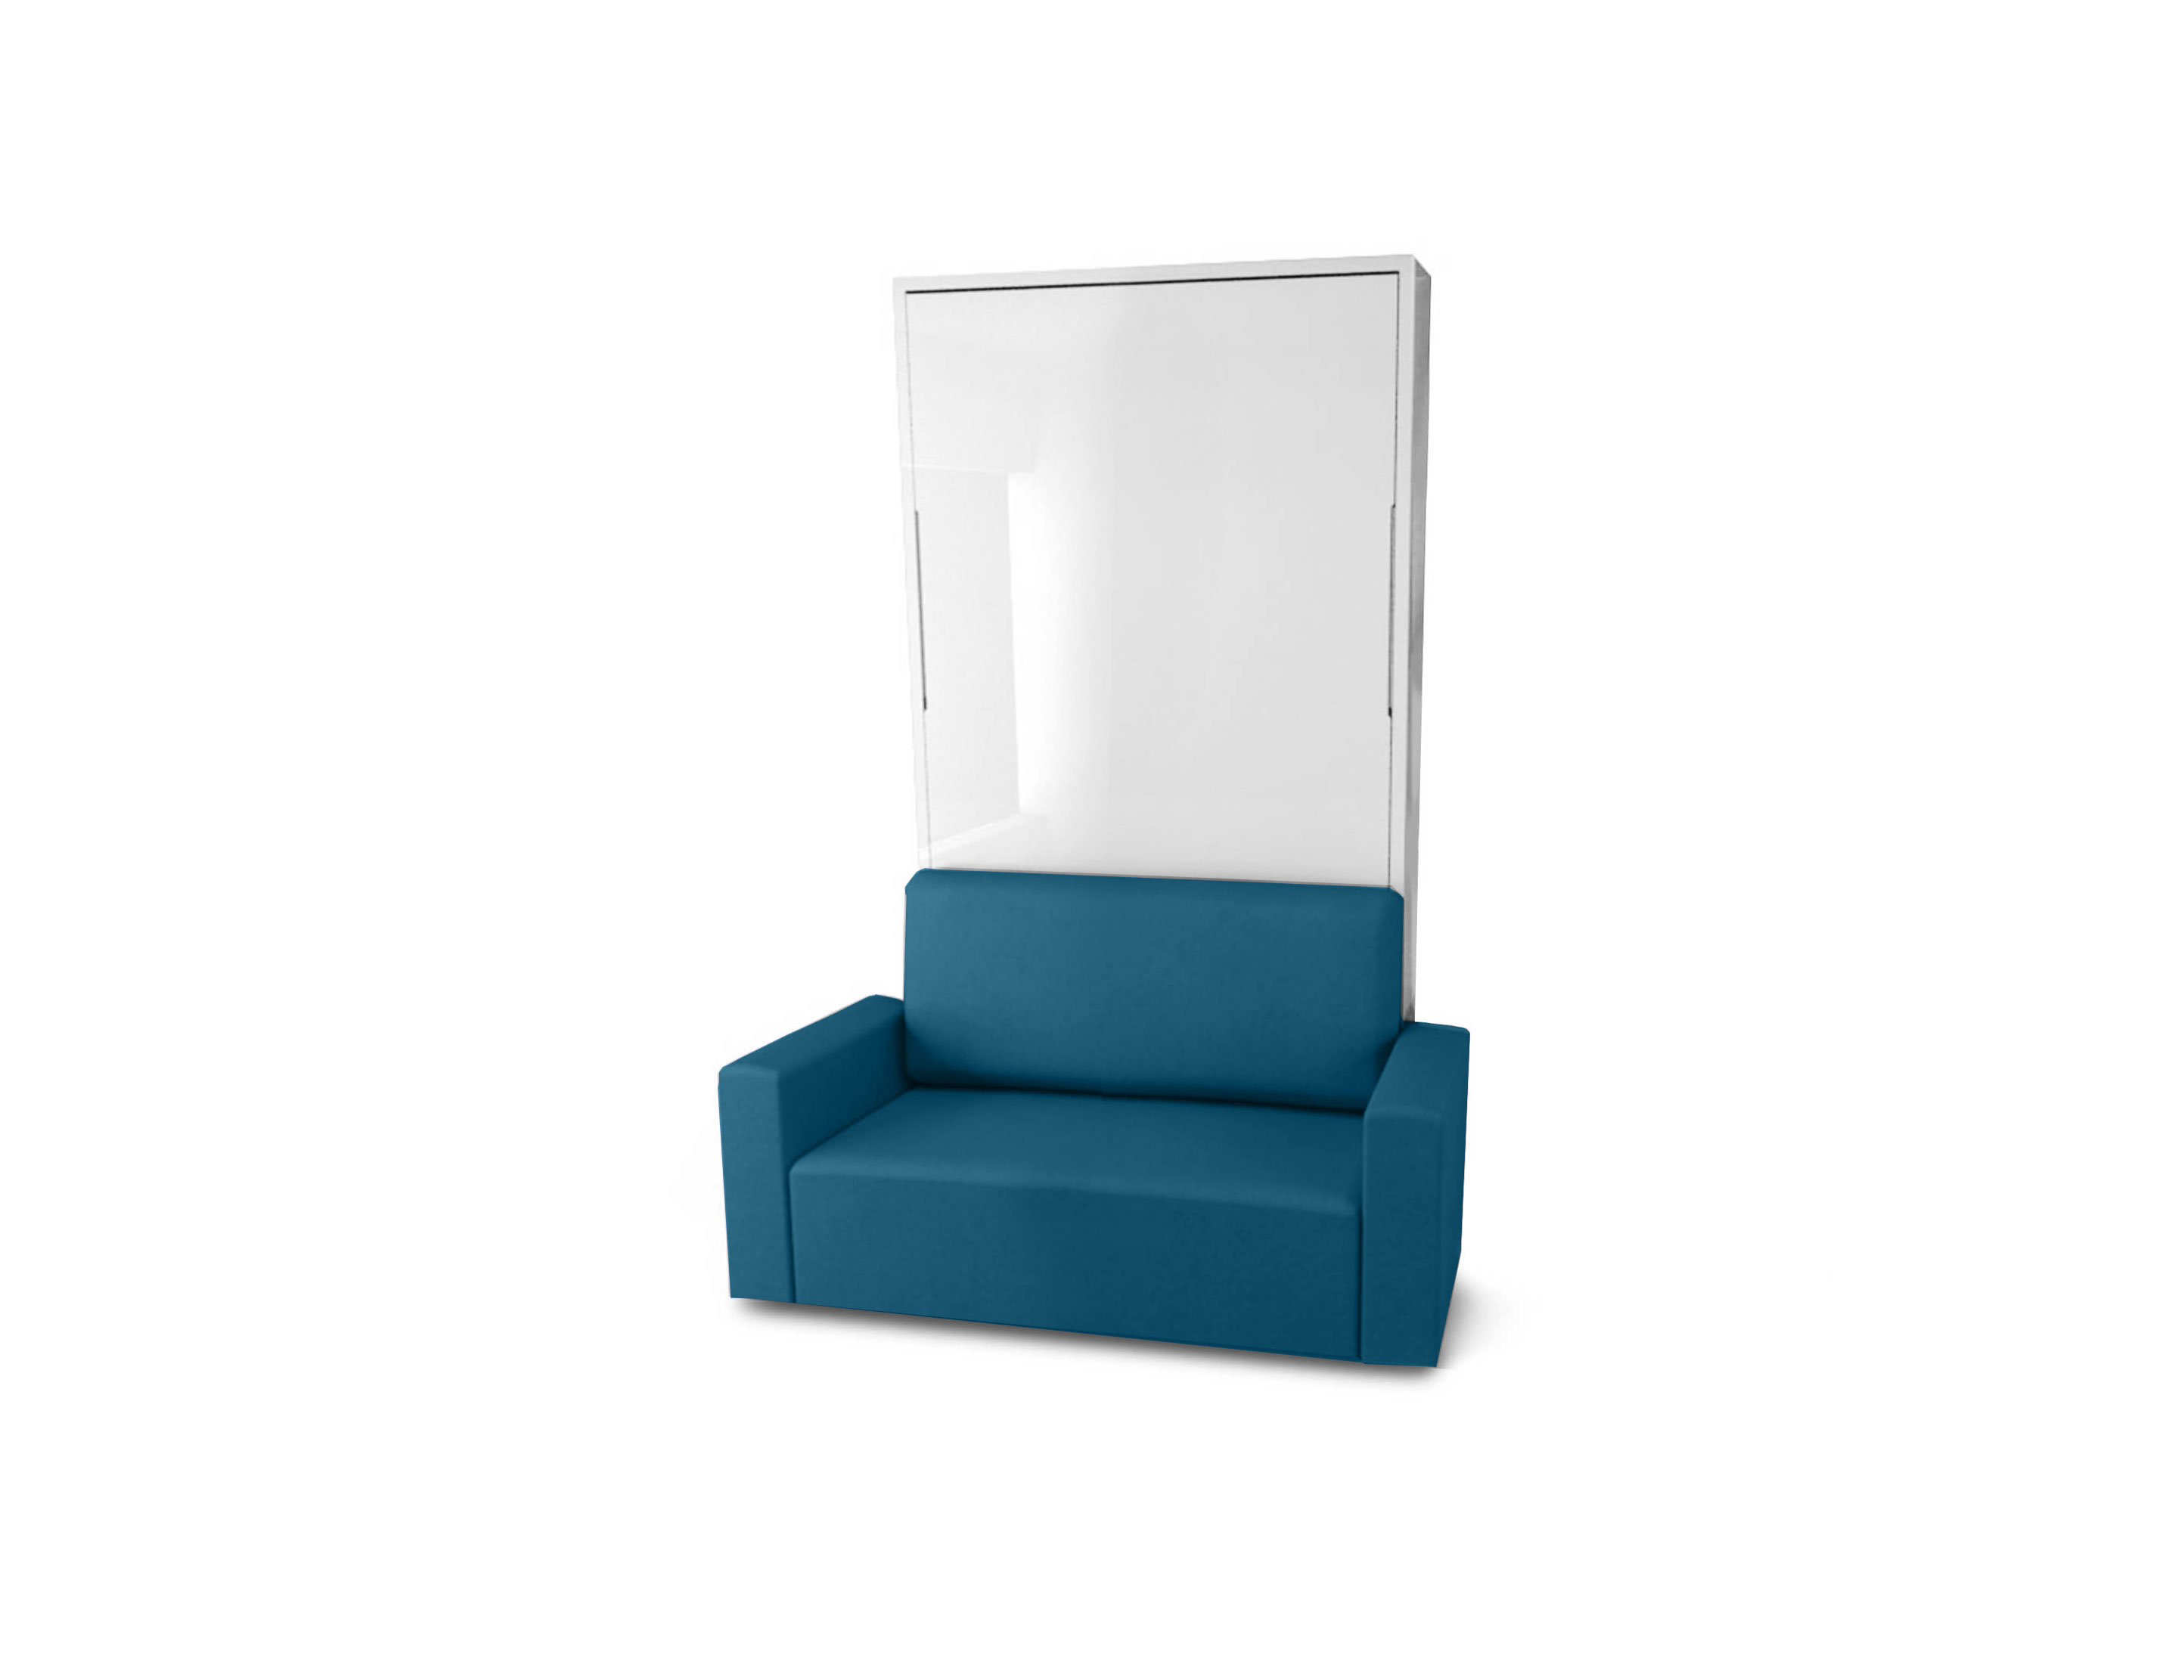 murphysofa twin vertical wall bed sofa